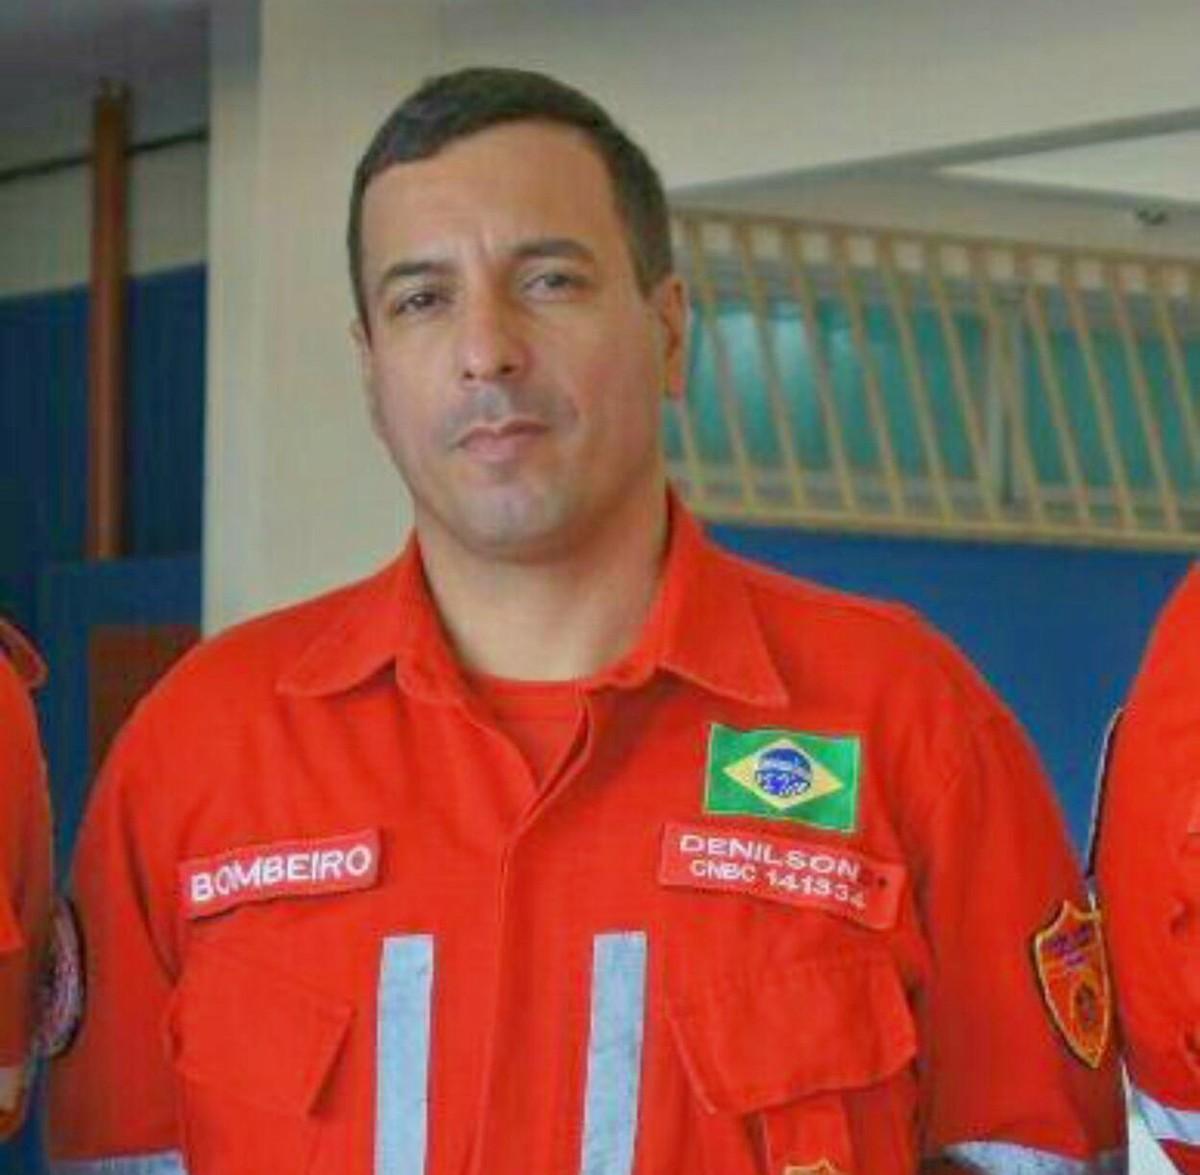 Bombeiro Civil desaparece na zona Oeste de Boa Vista e polícia investiga